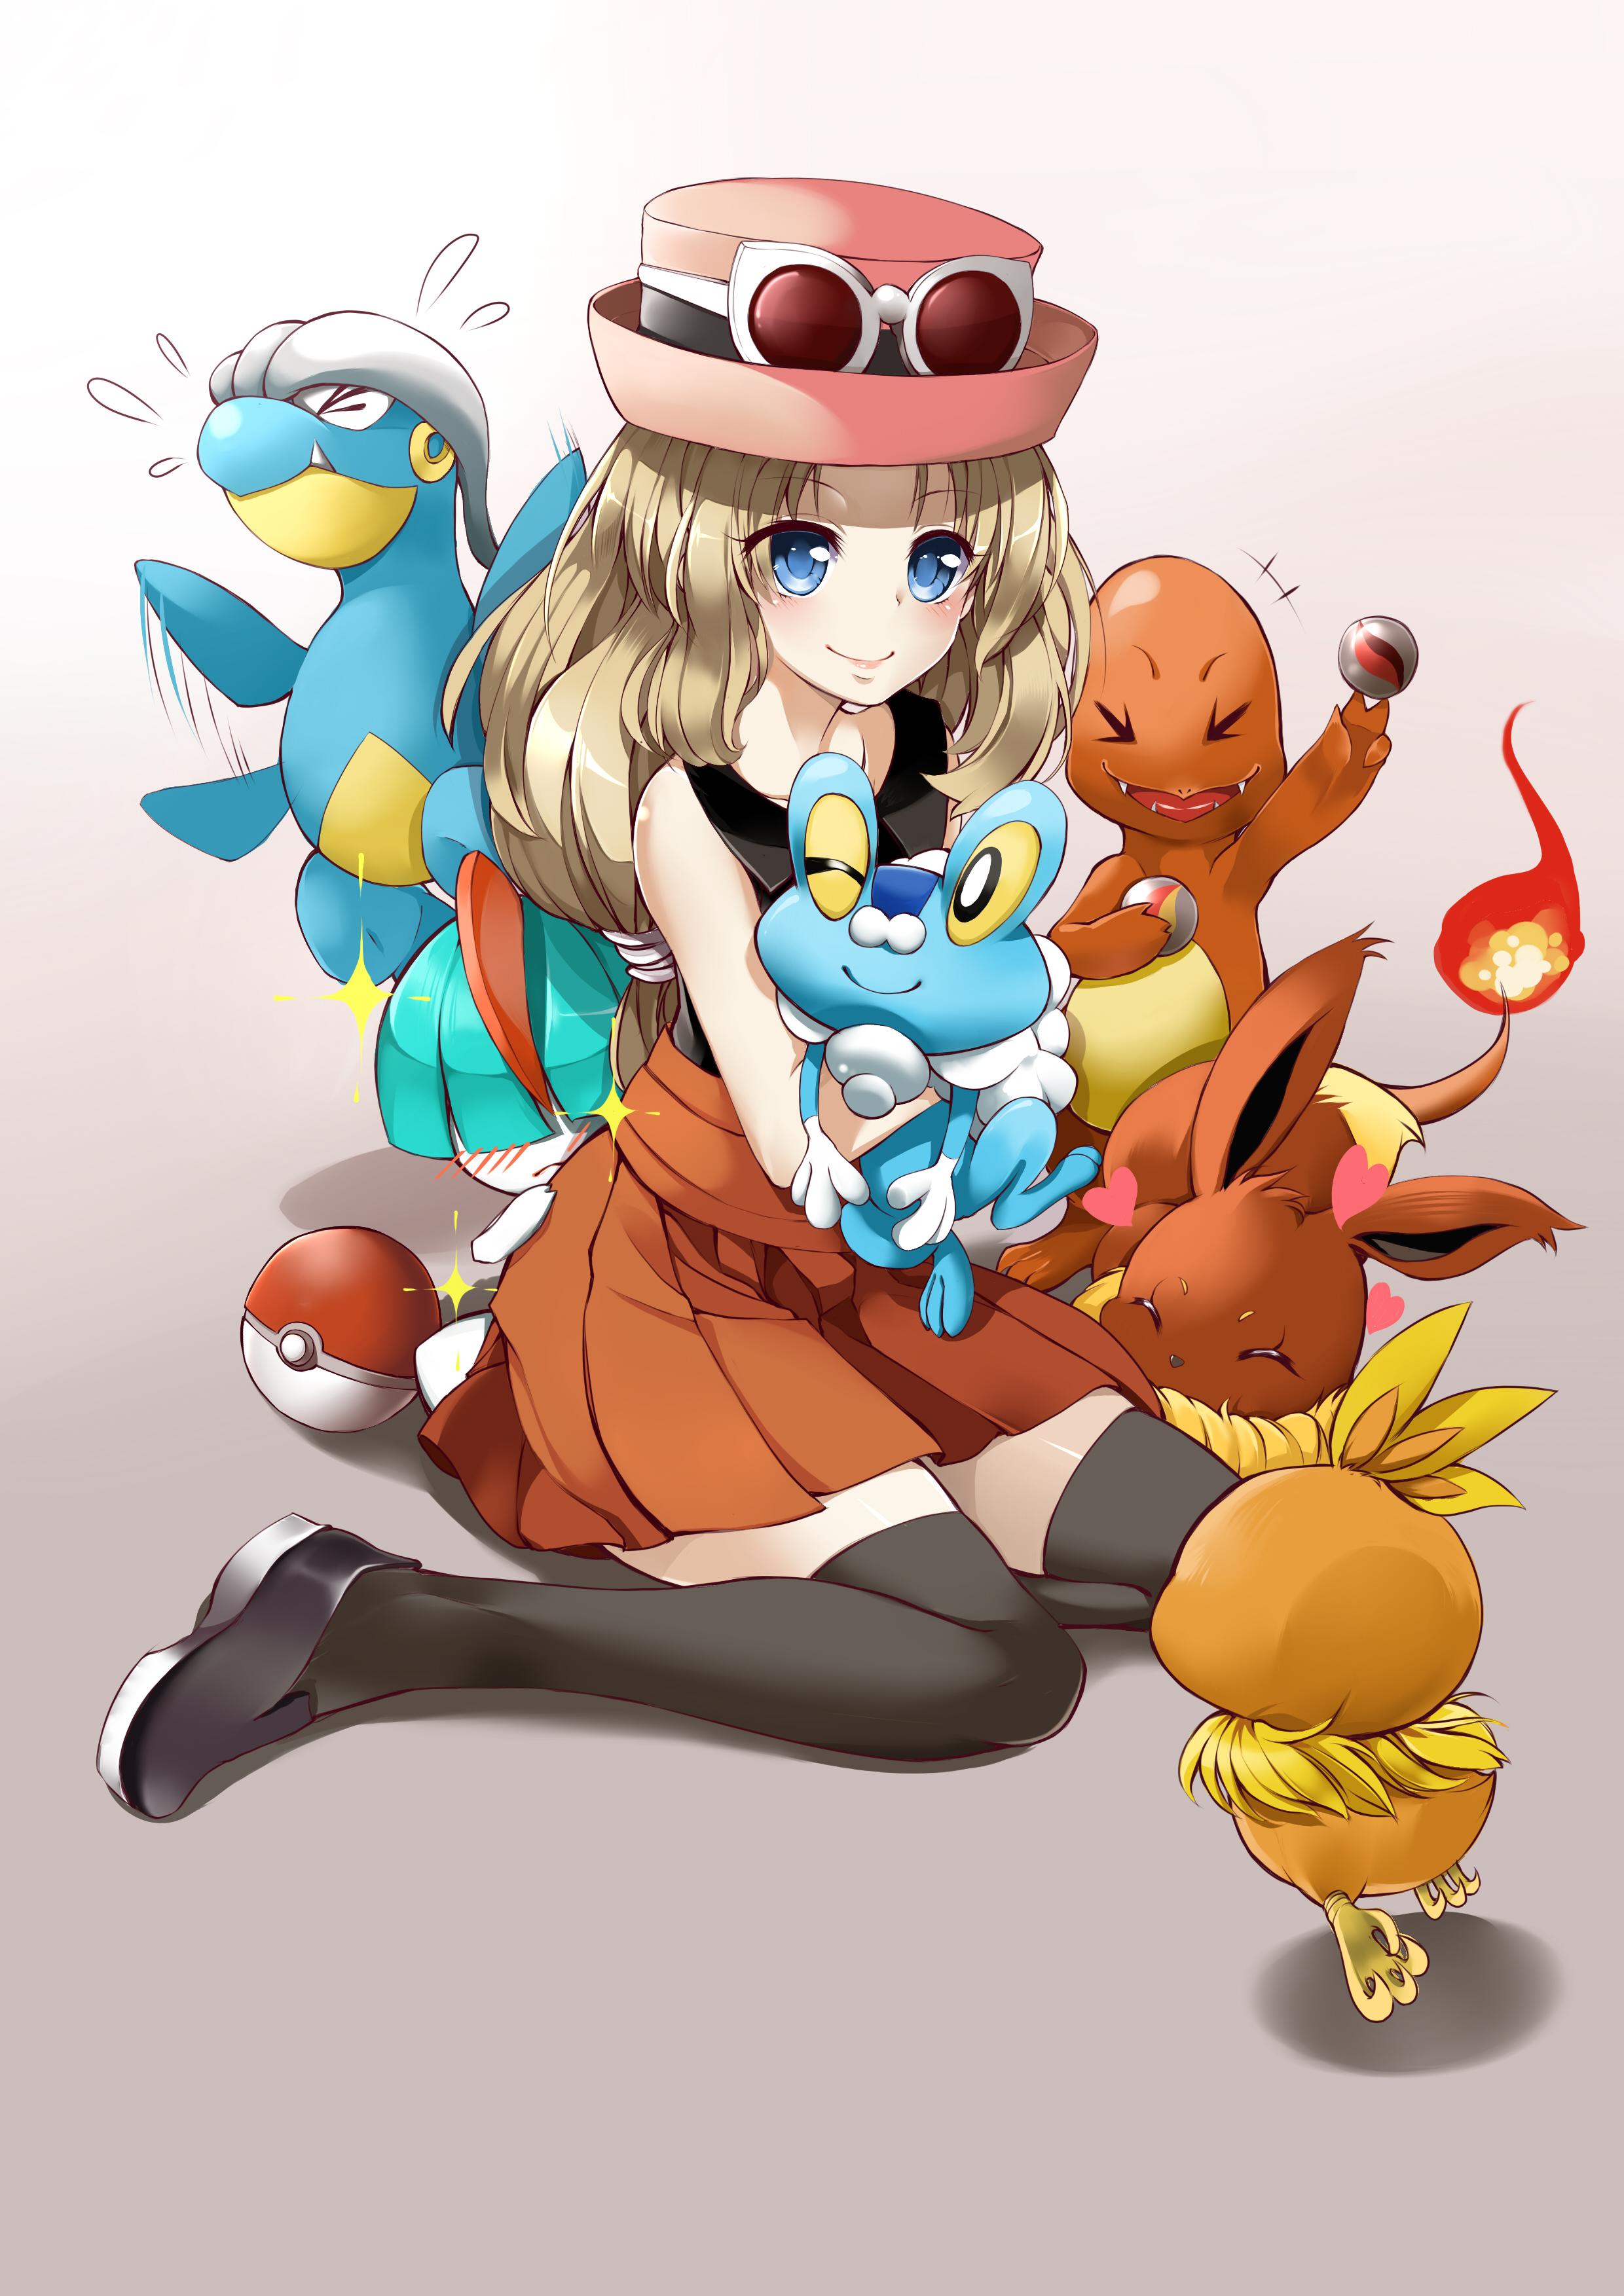 Pokémon Image #1764630 - Zerochan Anime Image Board